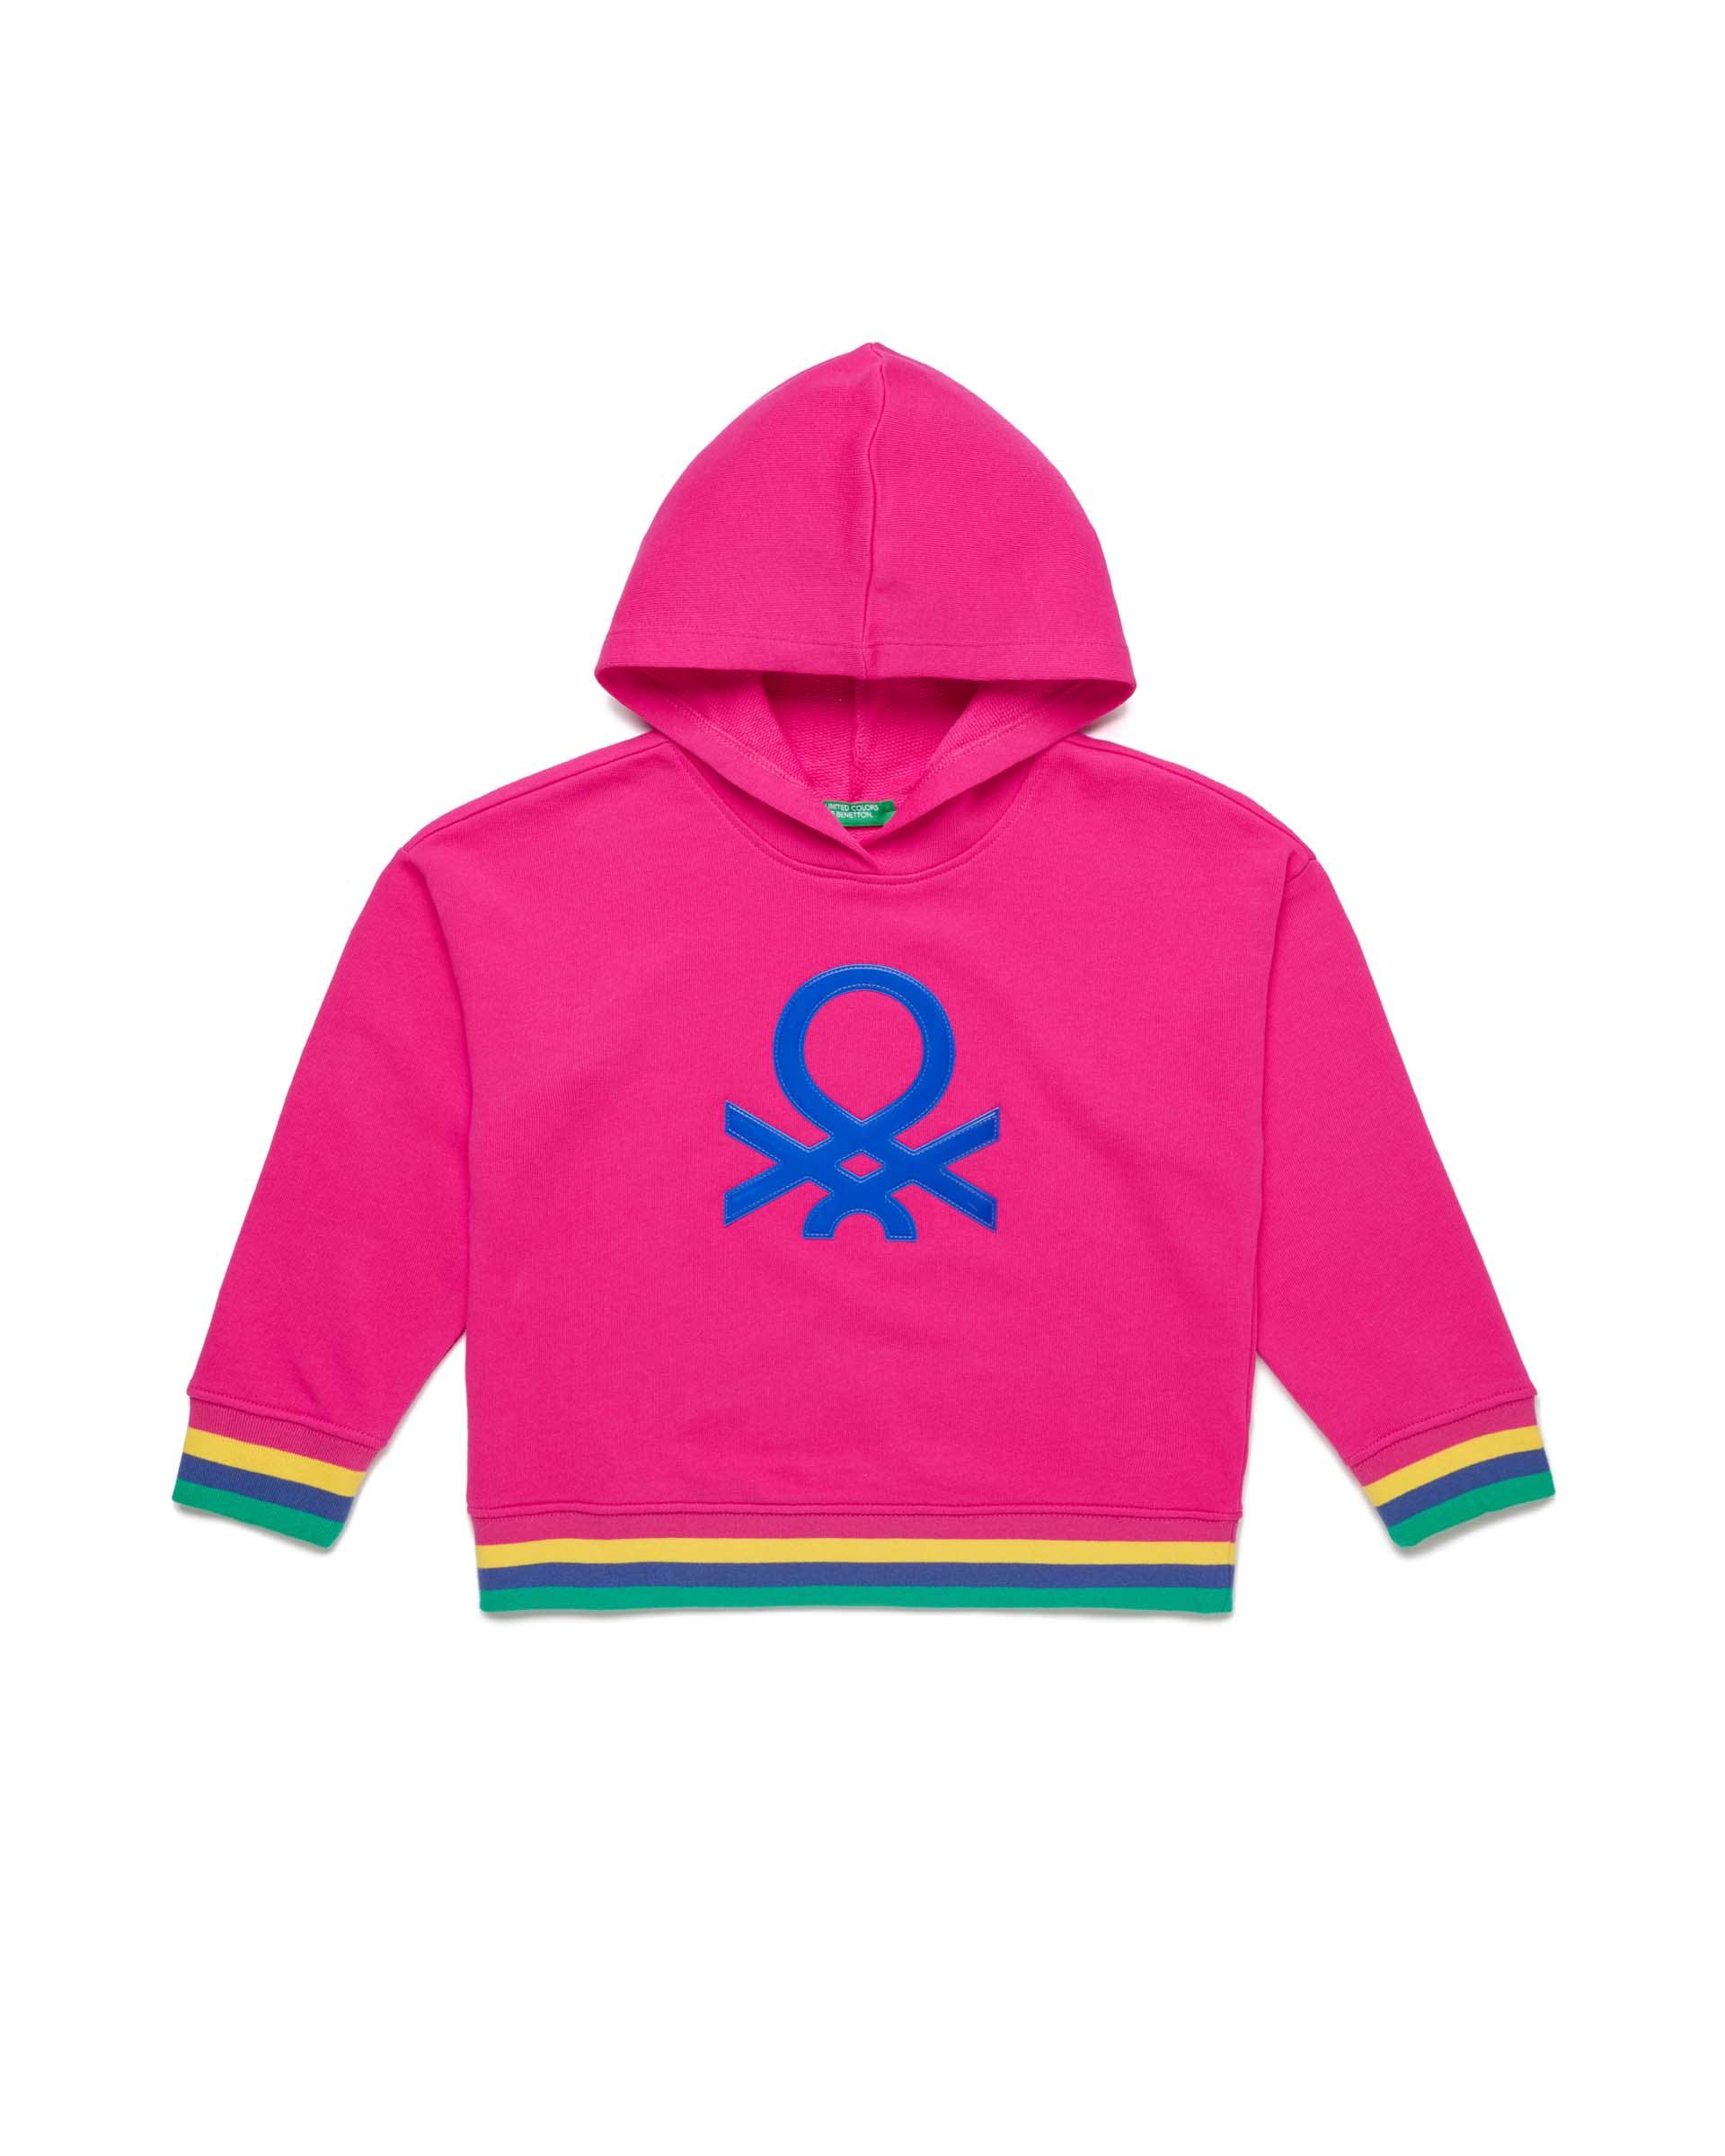 Купить 20P_3J68C2175_2L3, Толстовка для девочек Benetton 3J68C2175_2L3 р-р 128, United Colors of Benetton, Толстовки для девочек